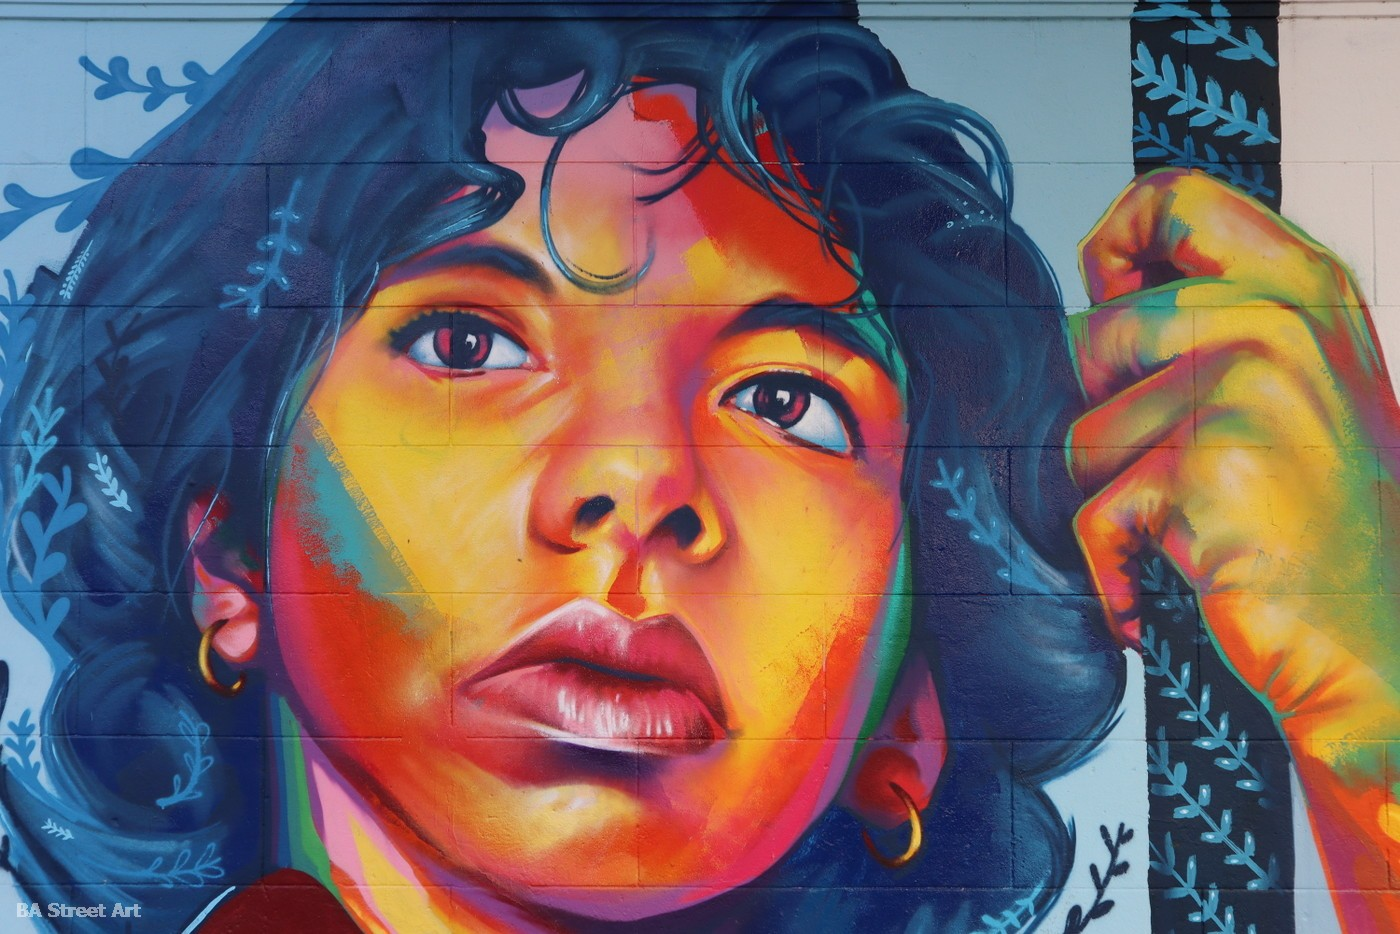 palermo graffiti tour arte urbano buenos aires street art soho arte urbano murales bs as buenosairesstreetart.com